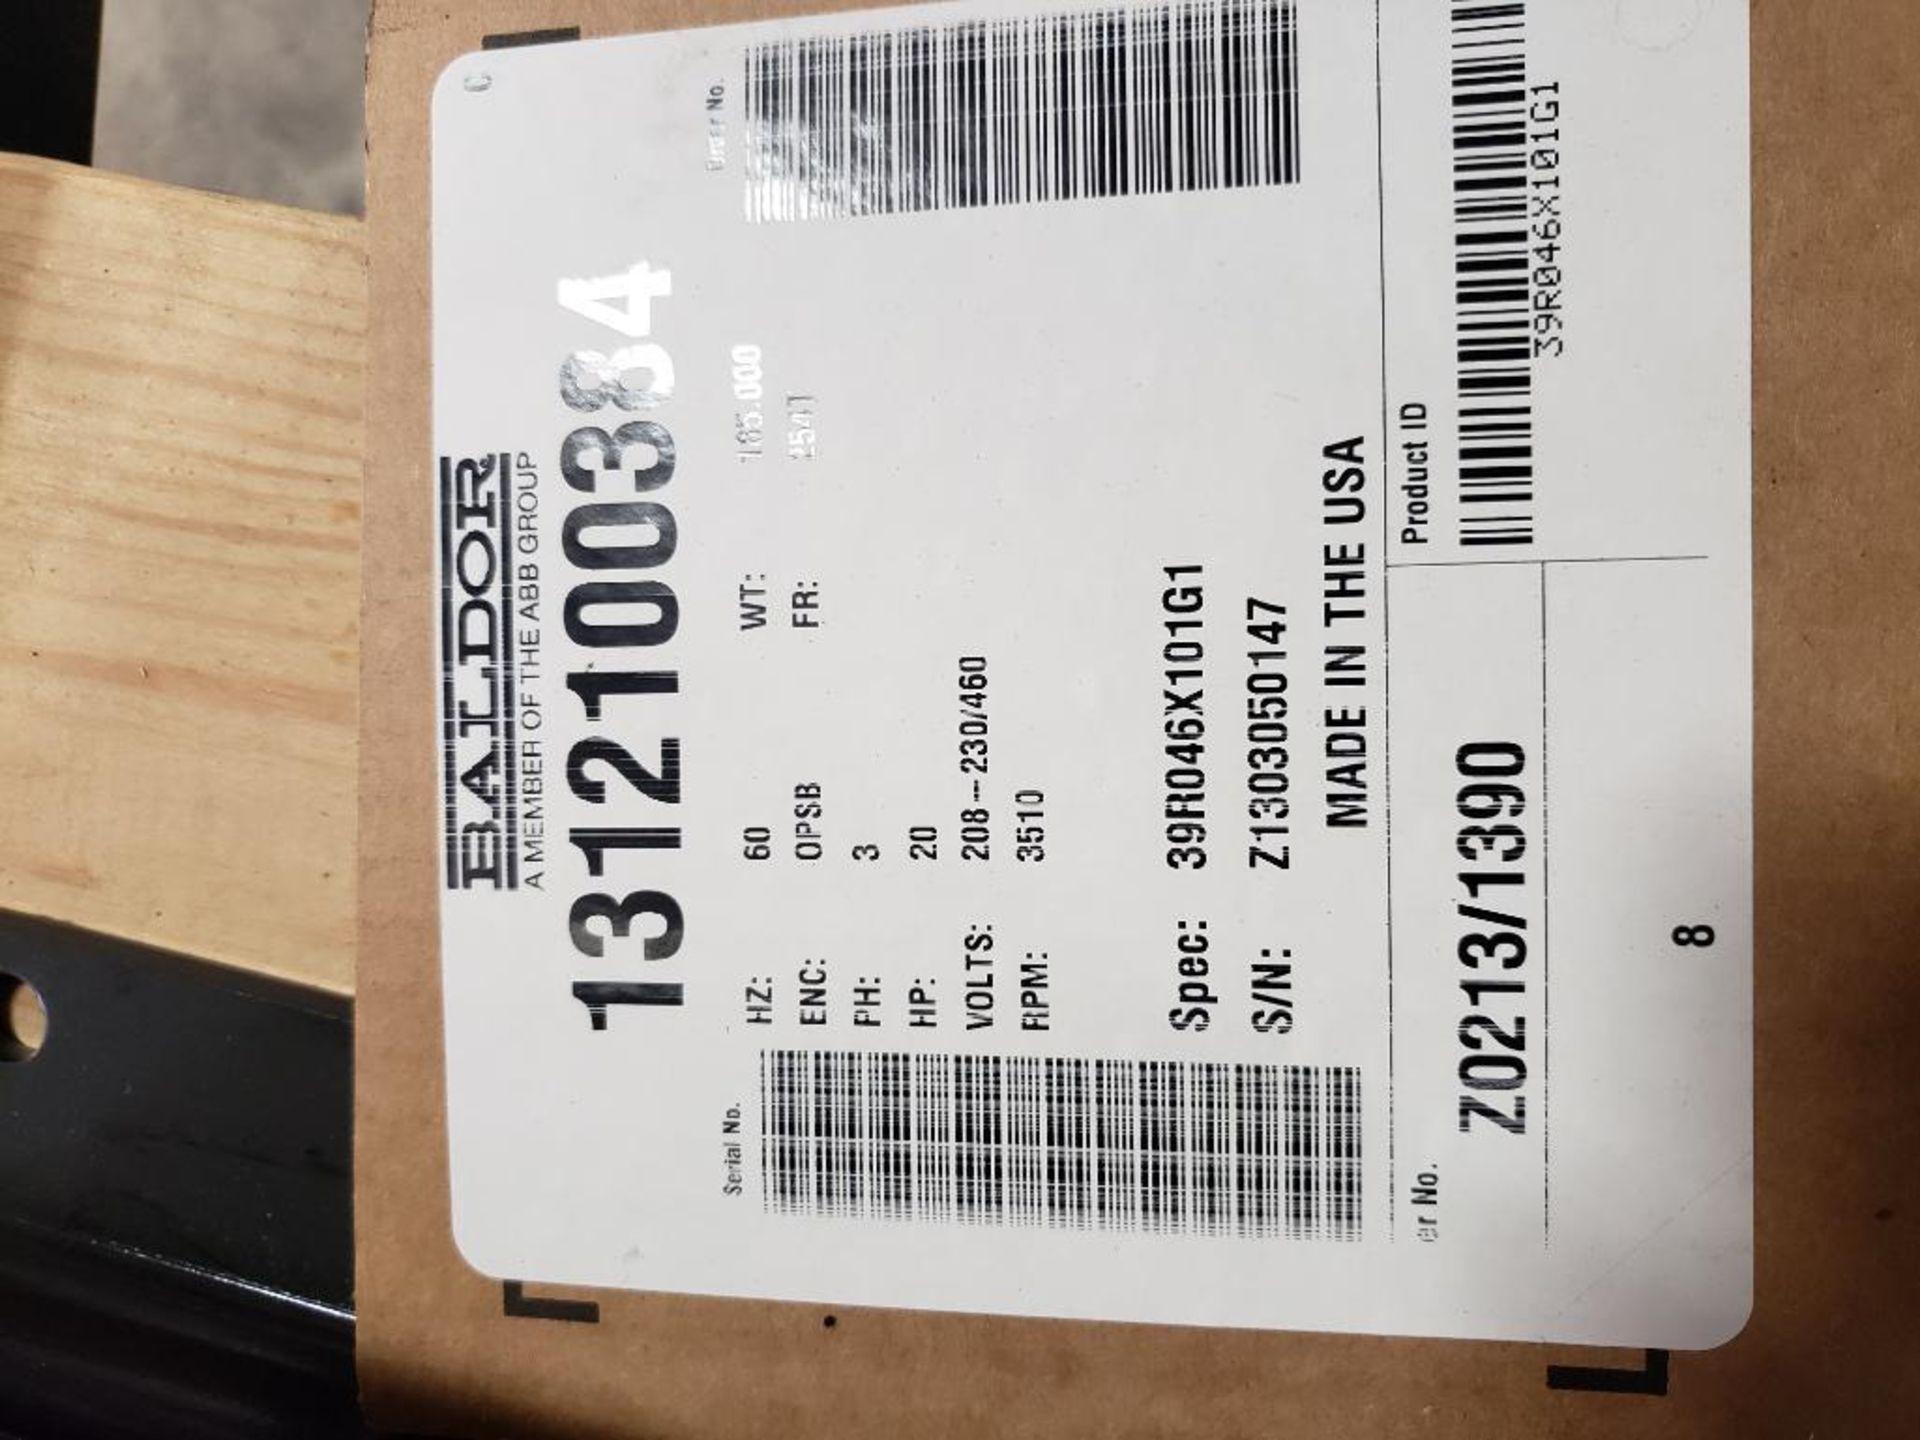 20HP Baldor Reliance 3PH SuperE Motor. 39R046X101G1. 208-230/460V, 3510RPM, 254T-Frame. - Image 3 of 7